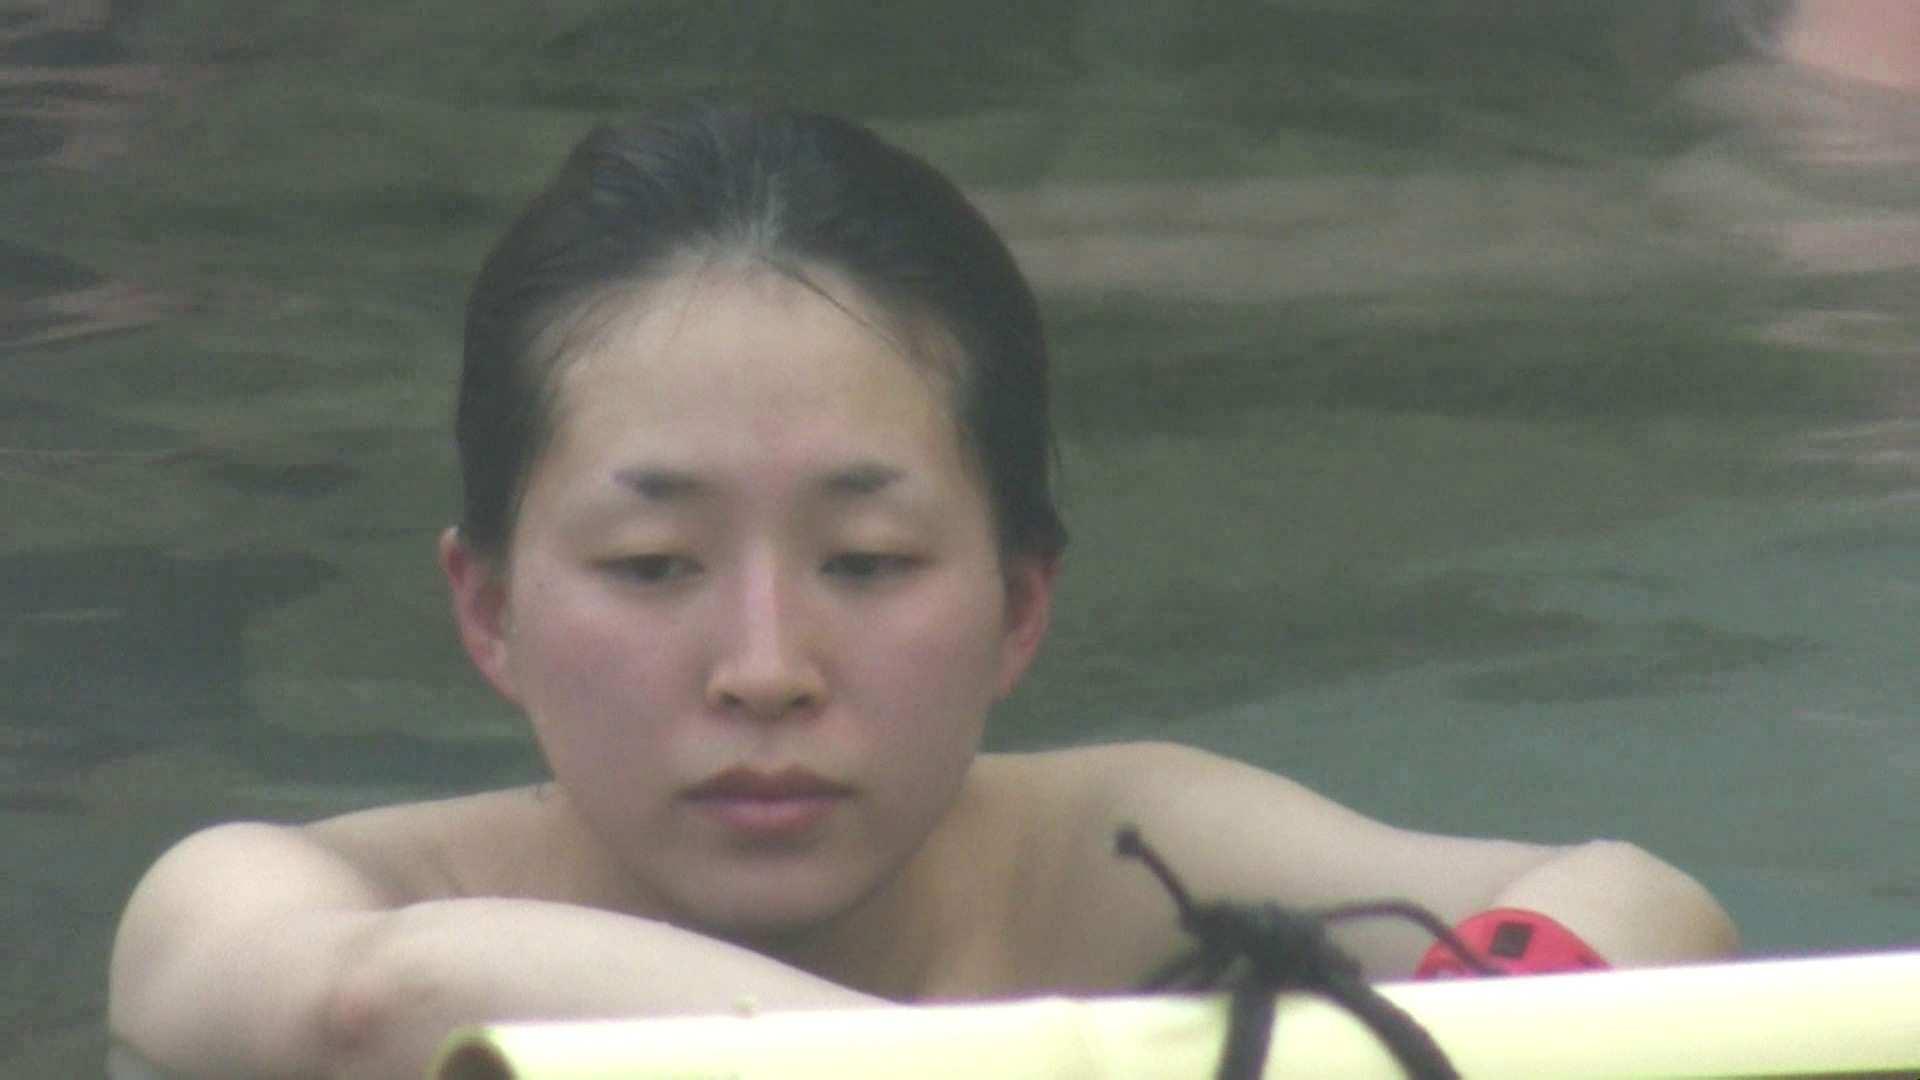 Aquaな露天風呂Vol.583 盗撮 戯れ無修正画像 106枚 62